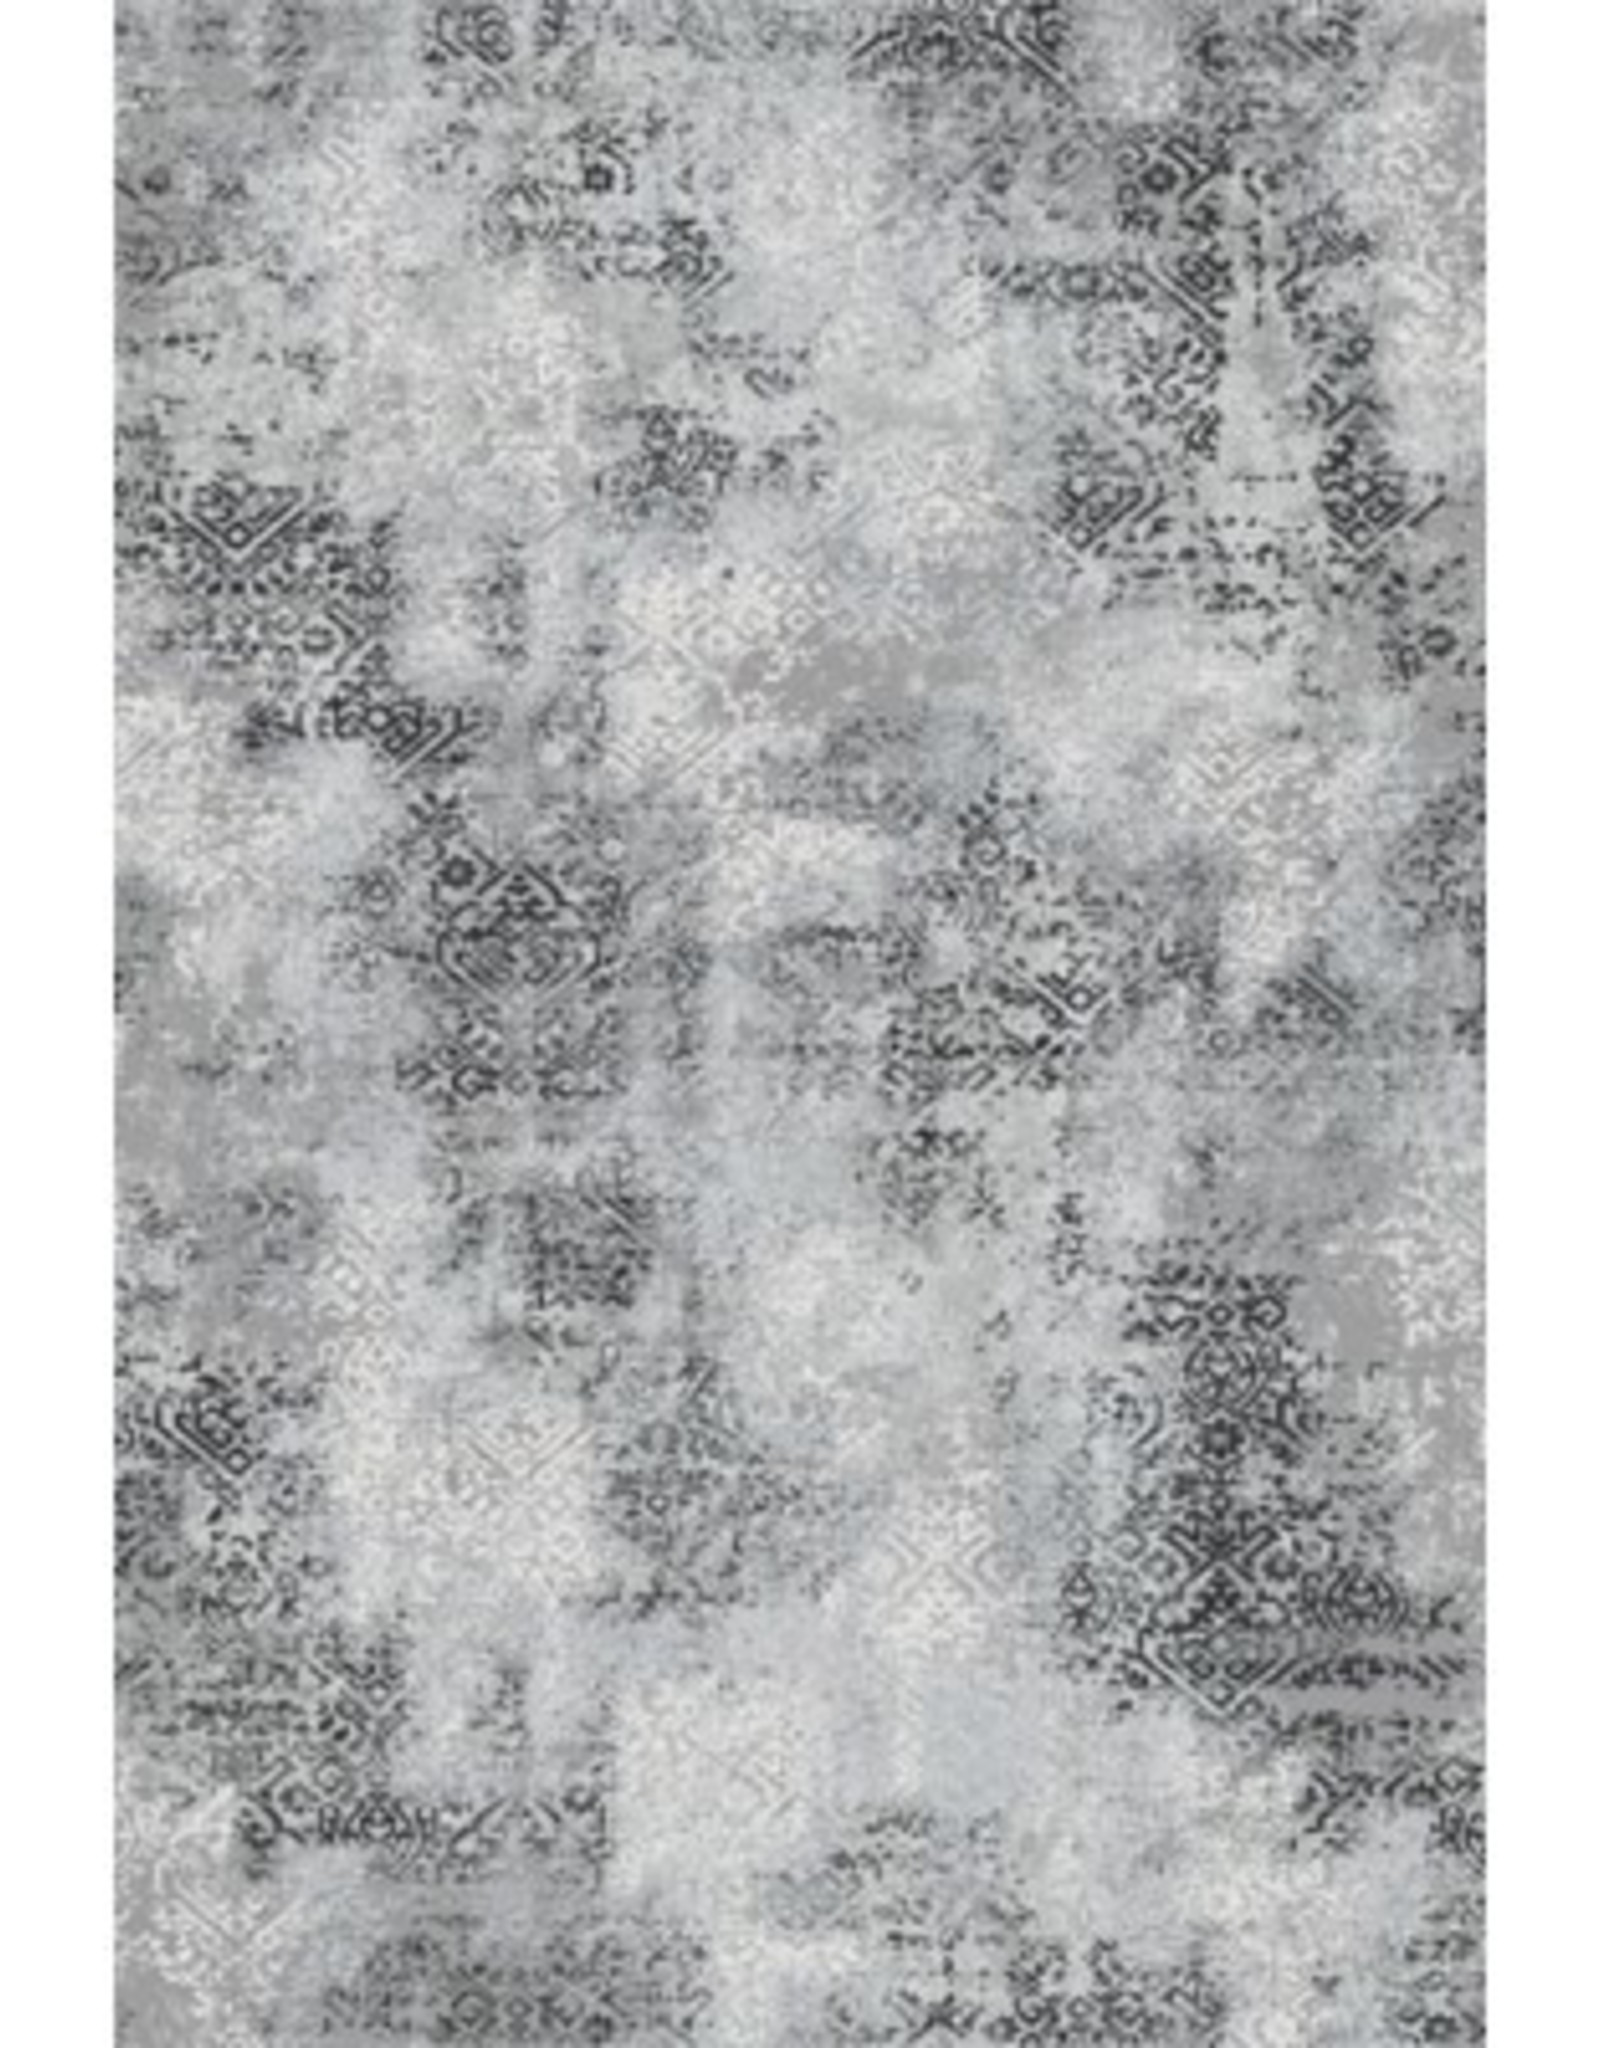 Rugs Viana Panache Soft Polypropylene Grey Anthracite 2 x 3 PAN-23-6037B-GRAN